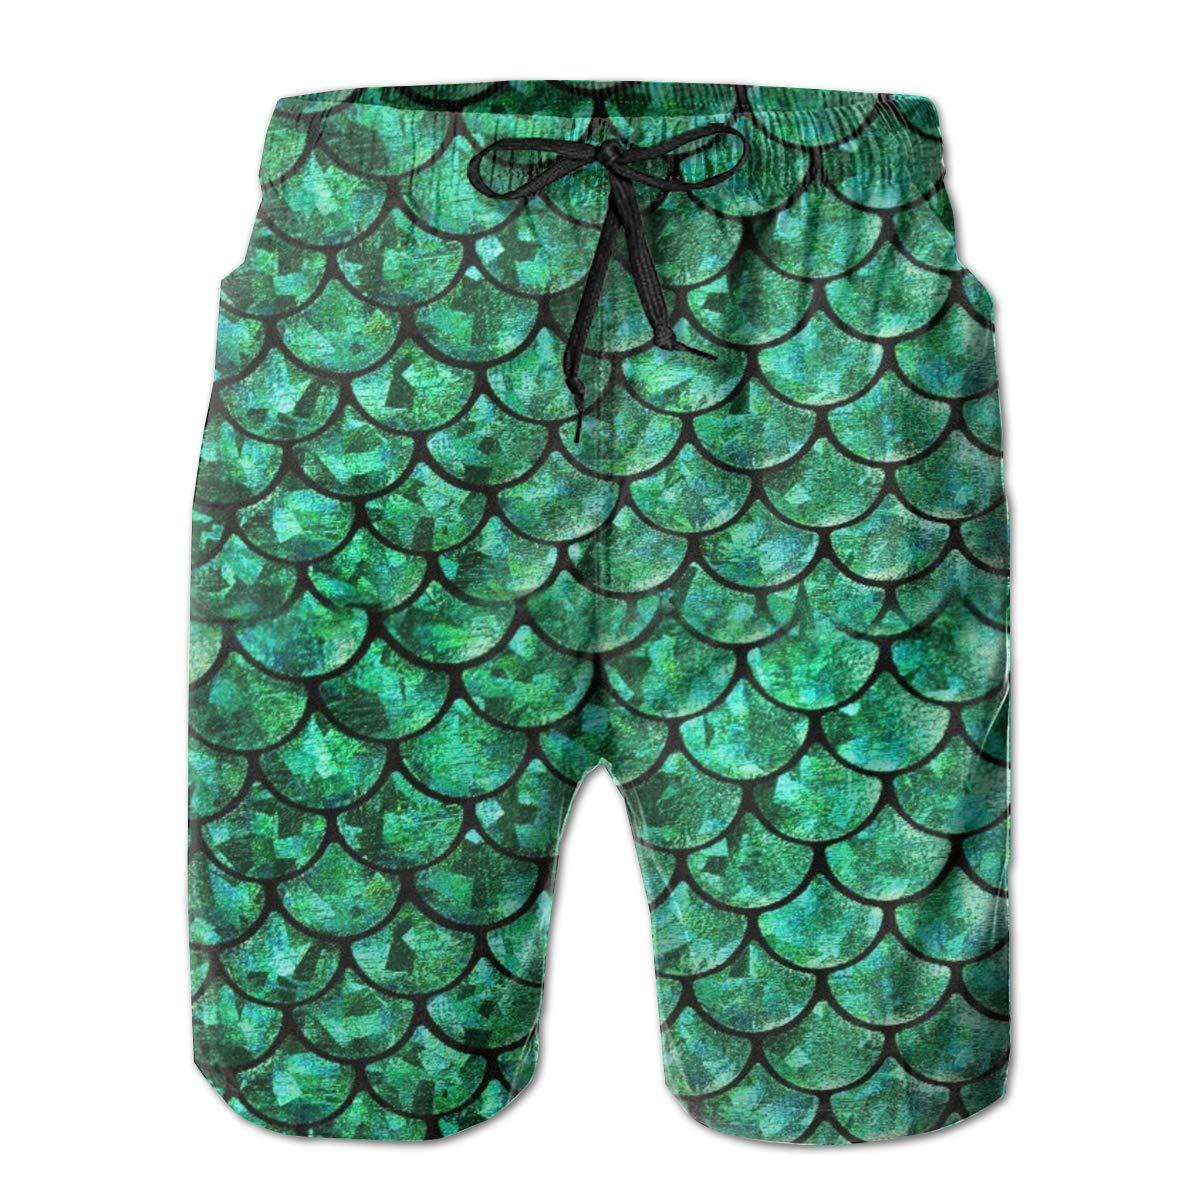 Quick Dry FANTASY SPACE Mens Big /&Tall Cargo Short Board Shorts Essentials Sportwear